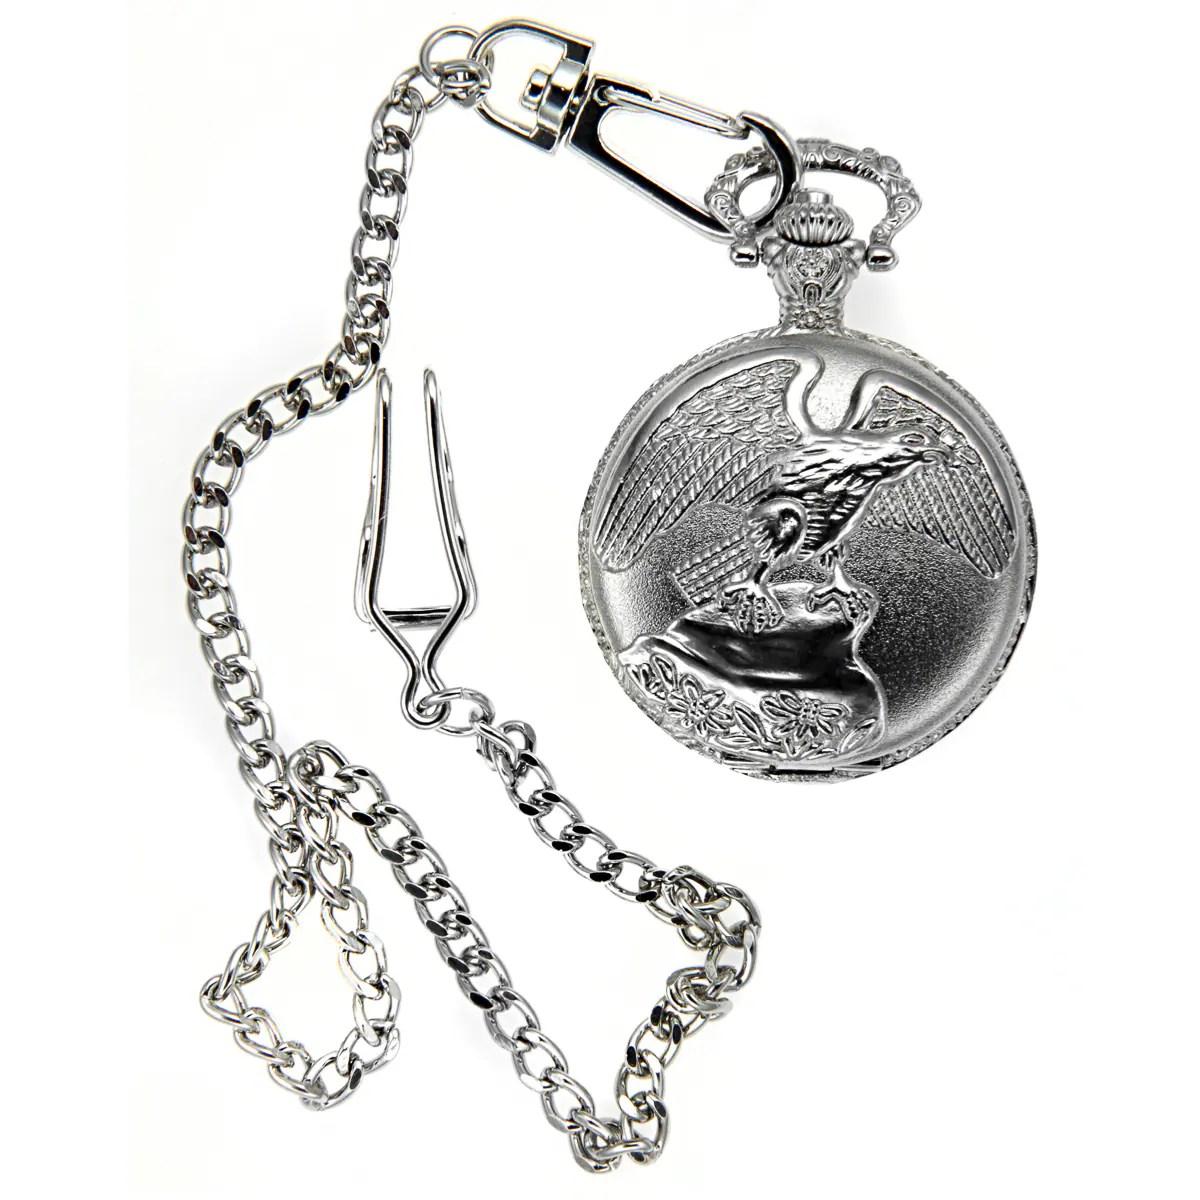 Eagle Engraved Pocket Watch